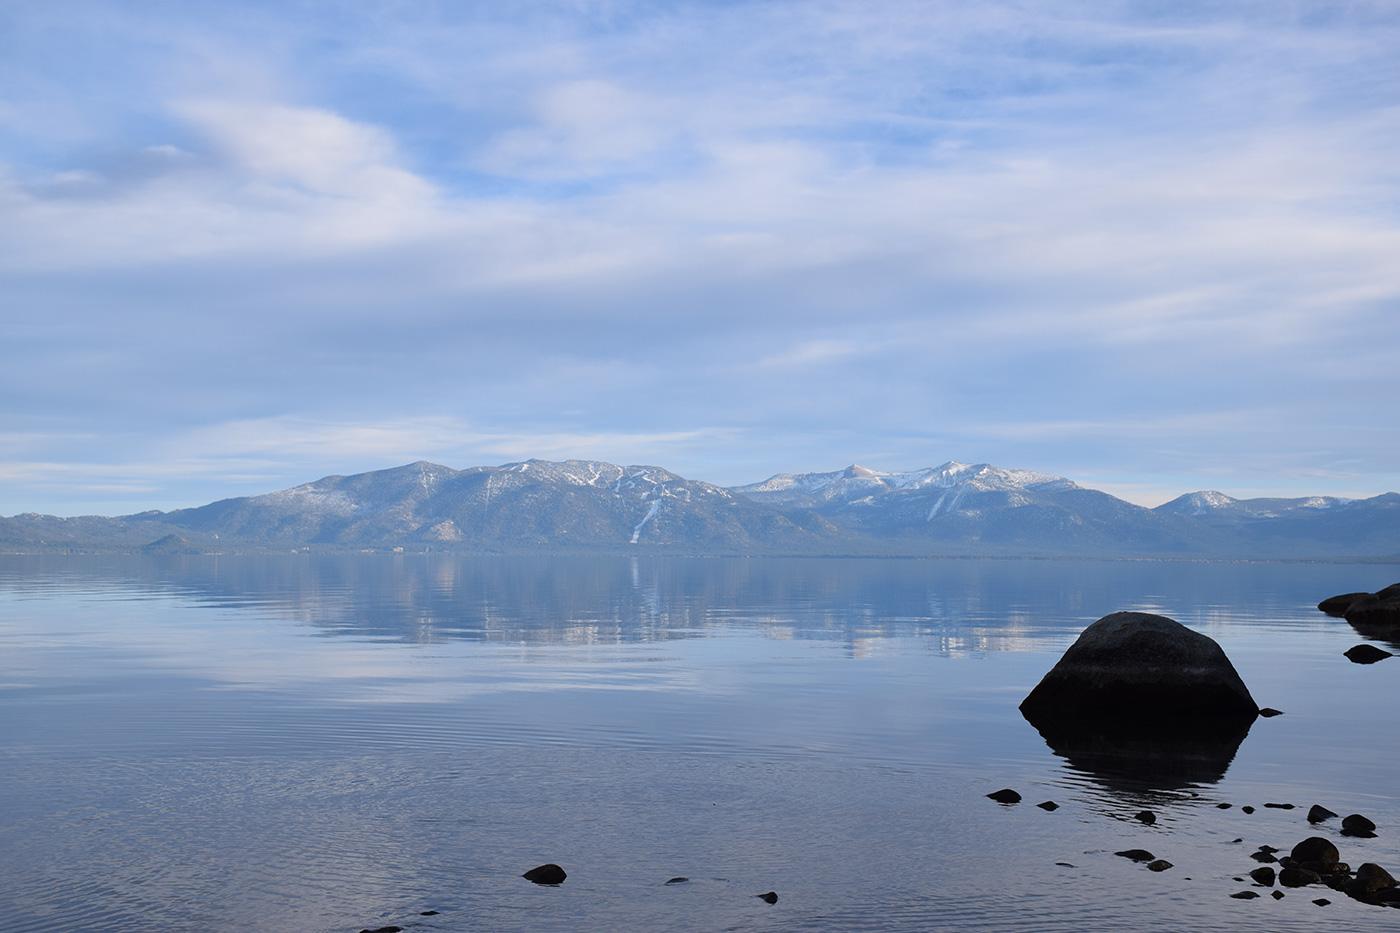 lake-tahoe-sugar-pine-point-hike-view-across-lake.jpg